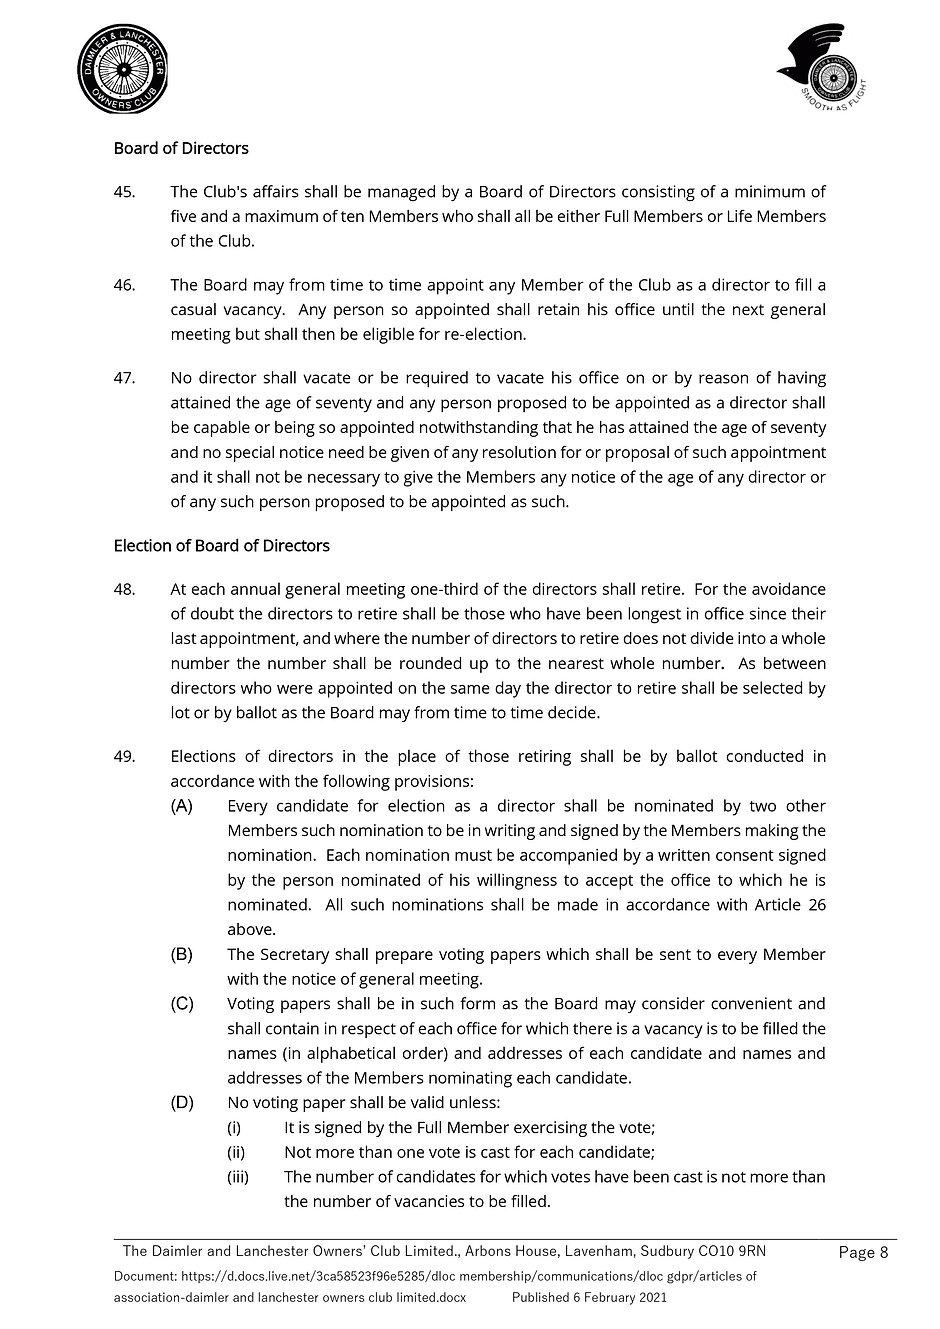 Articles of Association-Daimler and Lanc